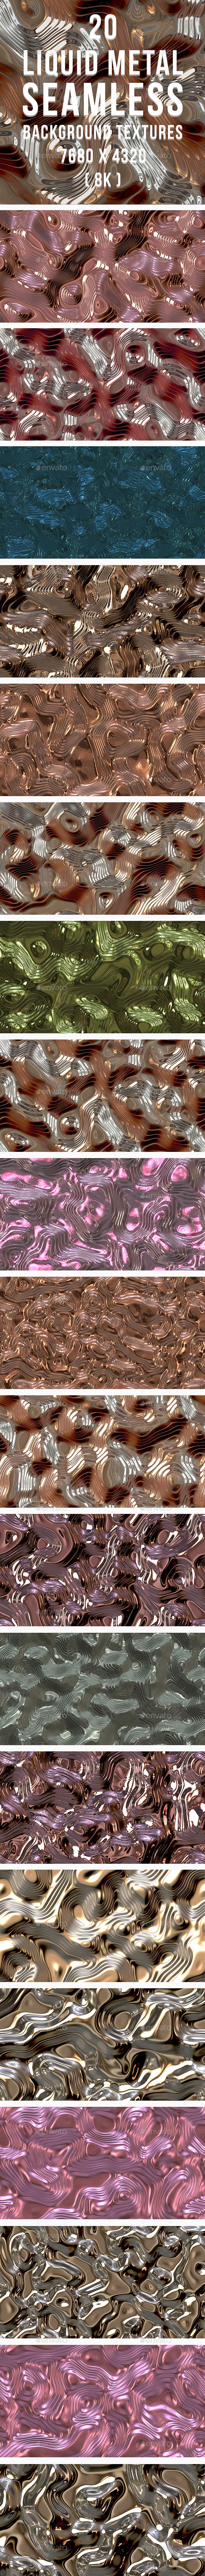 GraphicRiver 20 Liquid Metal Seamless Background Textures 20322541